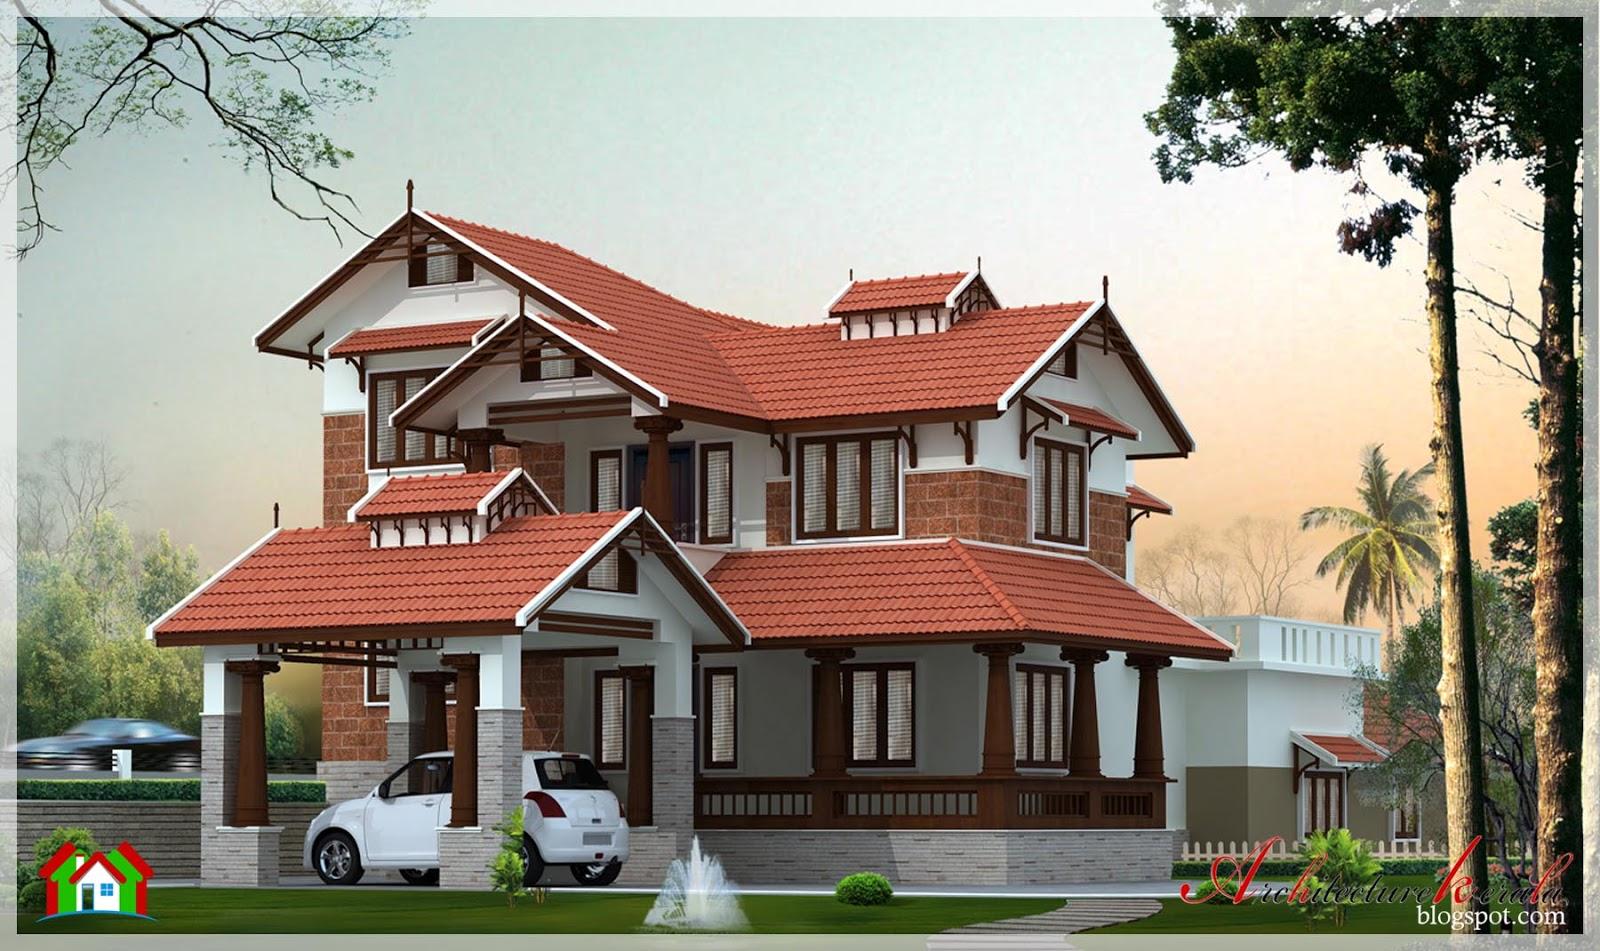 Architecture Kerala: 2900 SQUARE FEET BEAUTIFUL KERALA